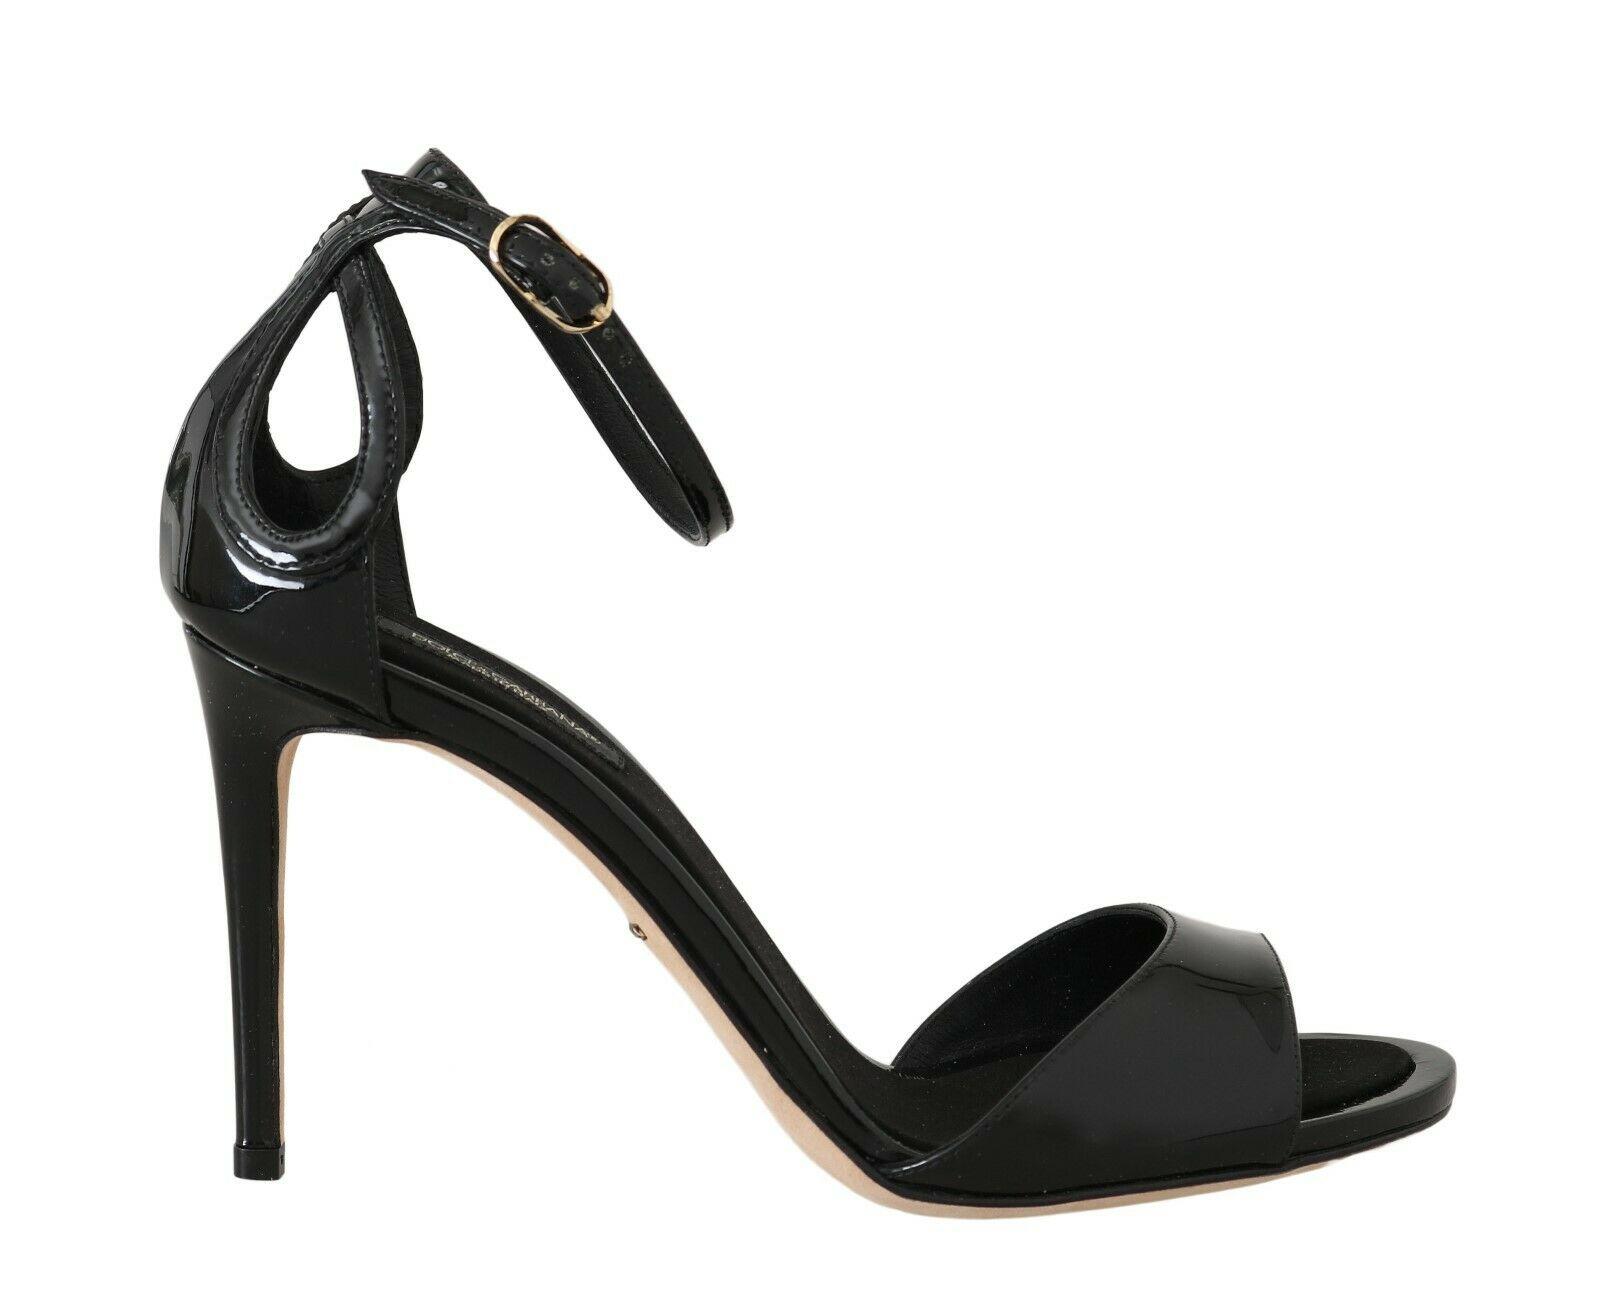 Dolce & Gabbana Women's Leather Stiletto Sandals Black LA5615 - EU40/US9.5